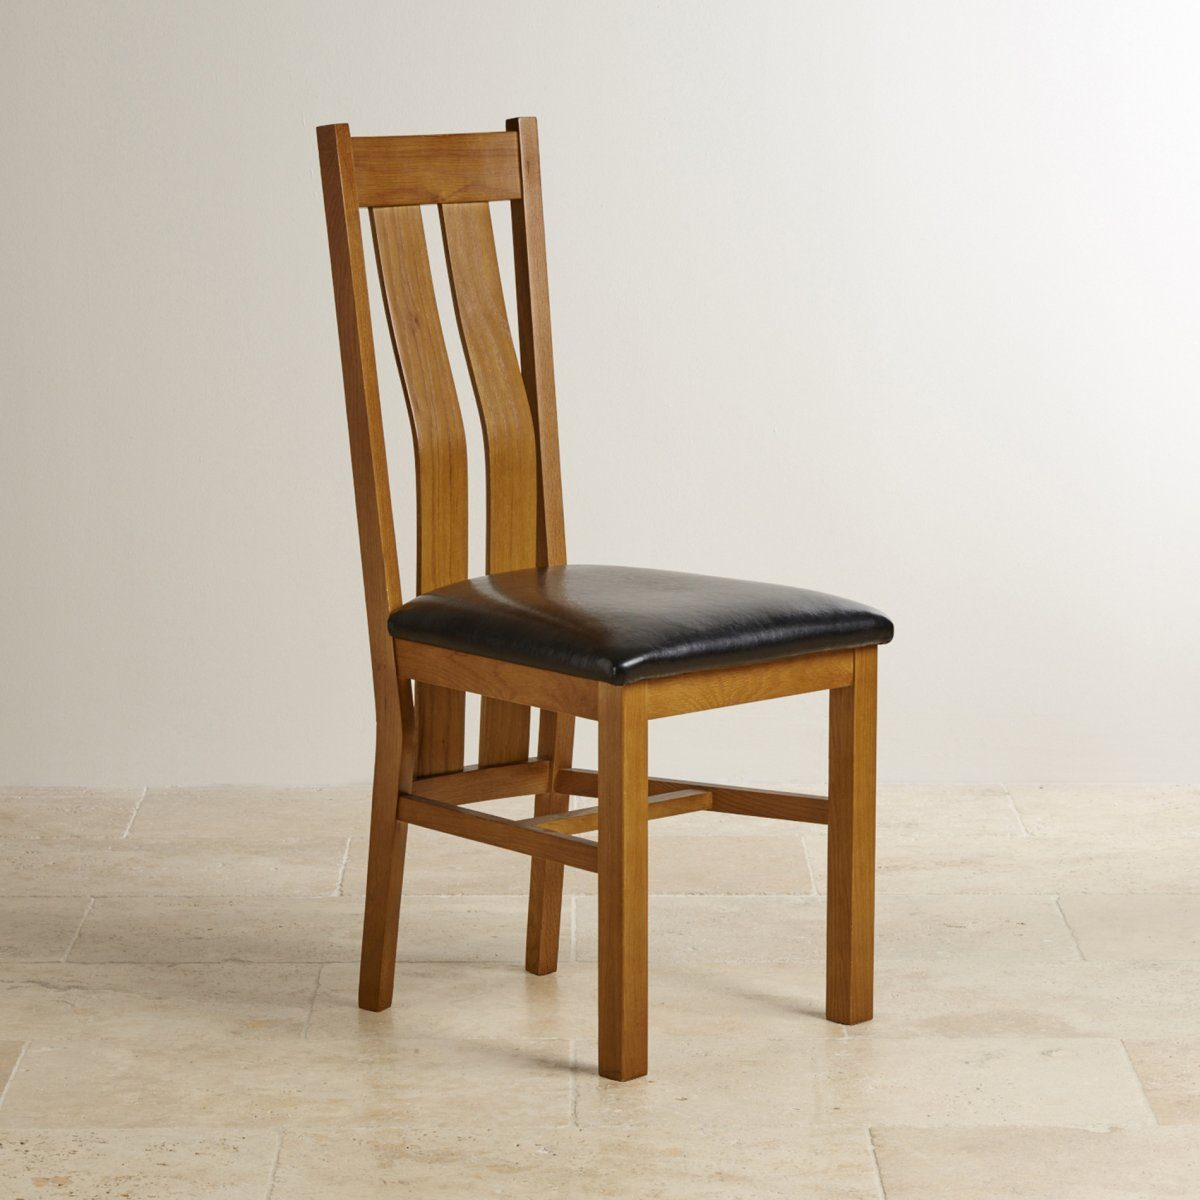 Chamfer Rastic Solid OAK Dining Chair PU Pad